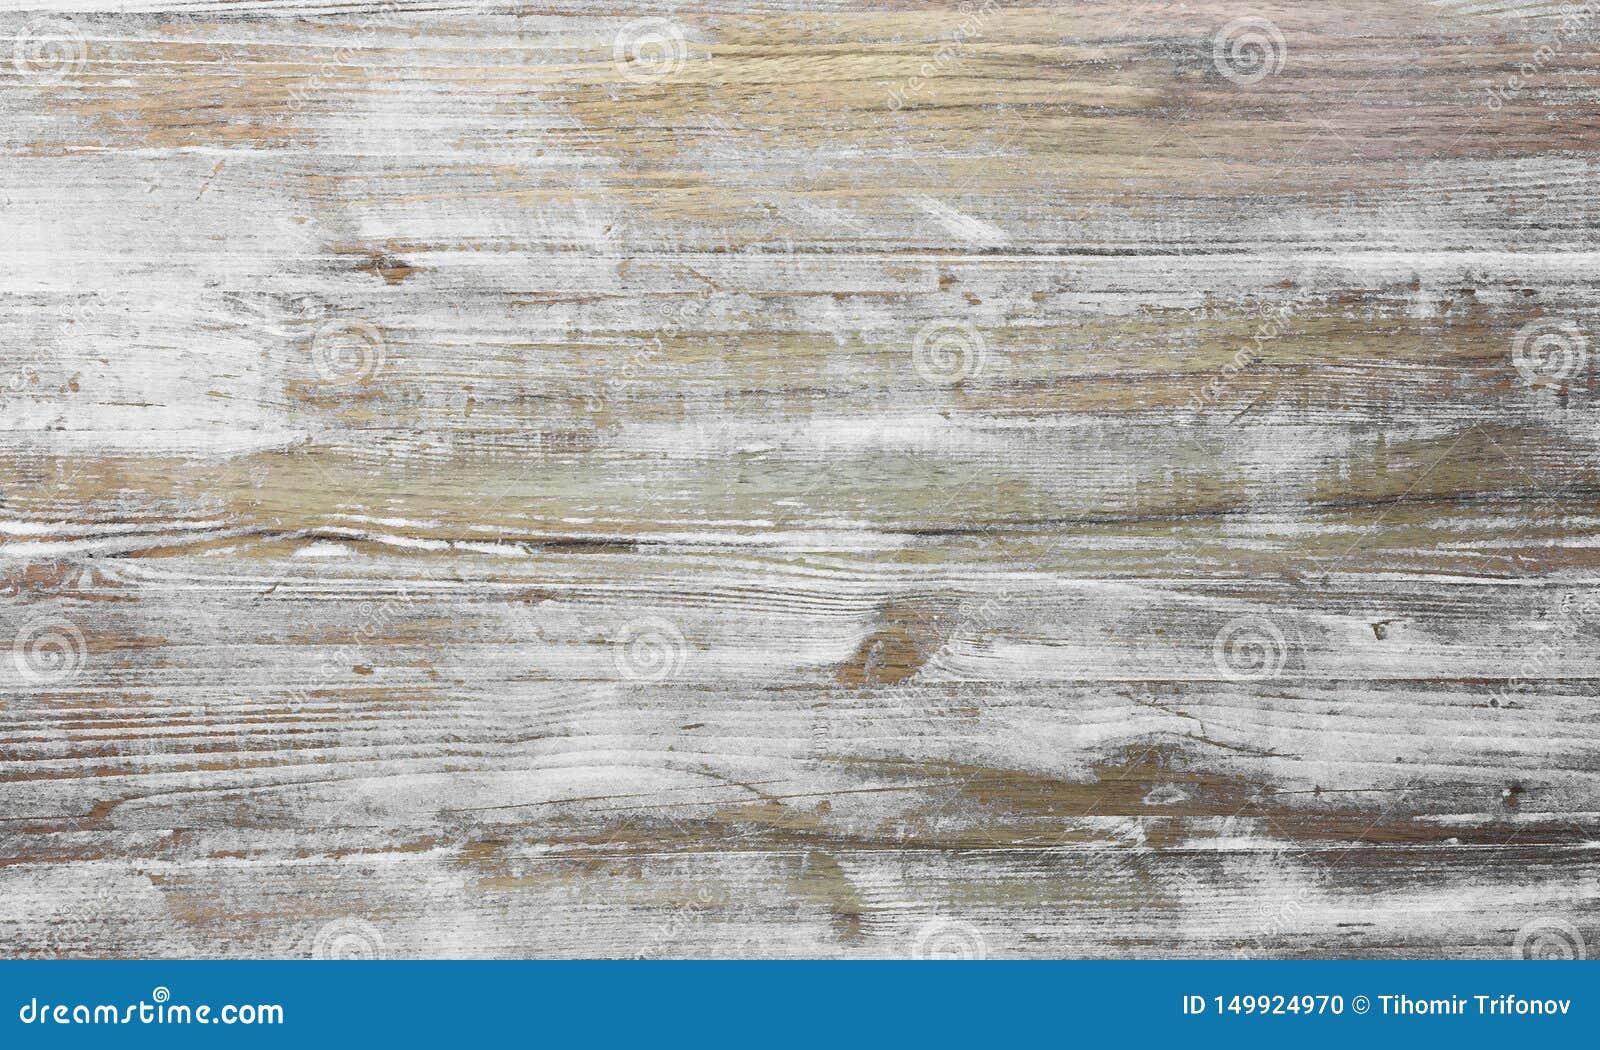 Wood brown background, dark wooden abstract texture